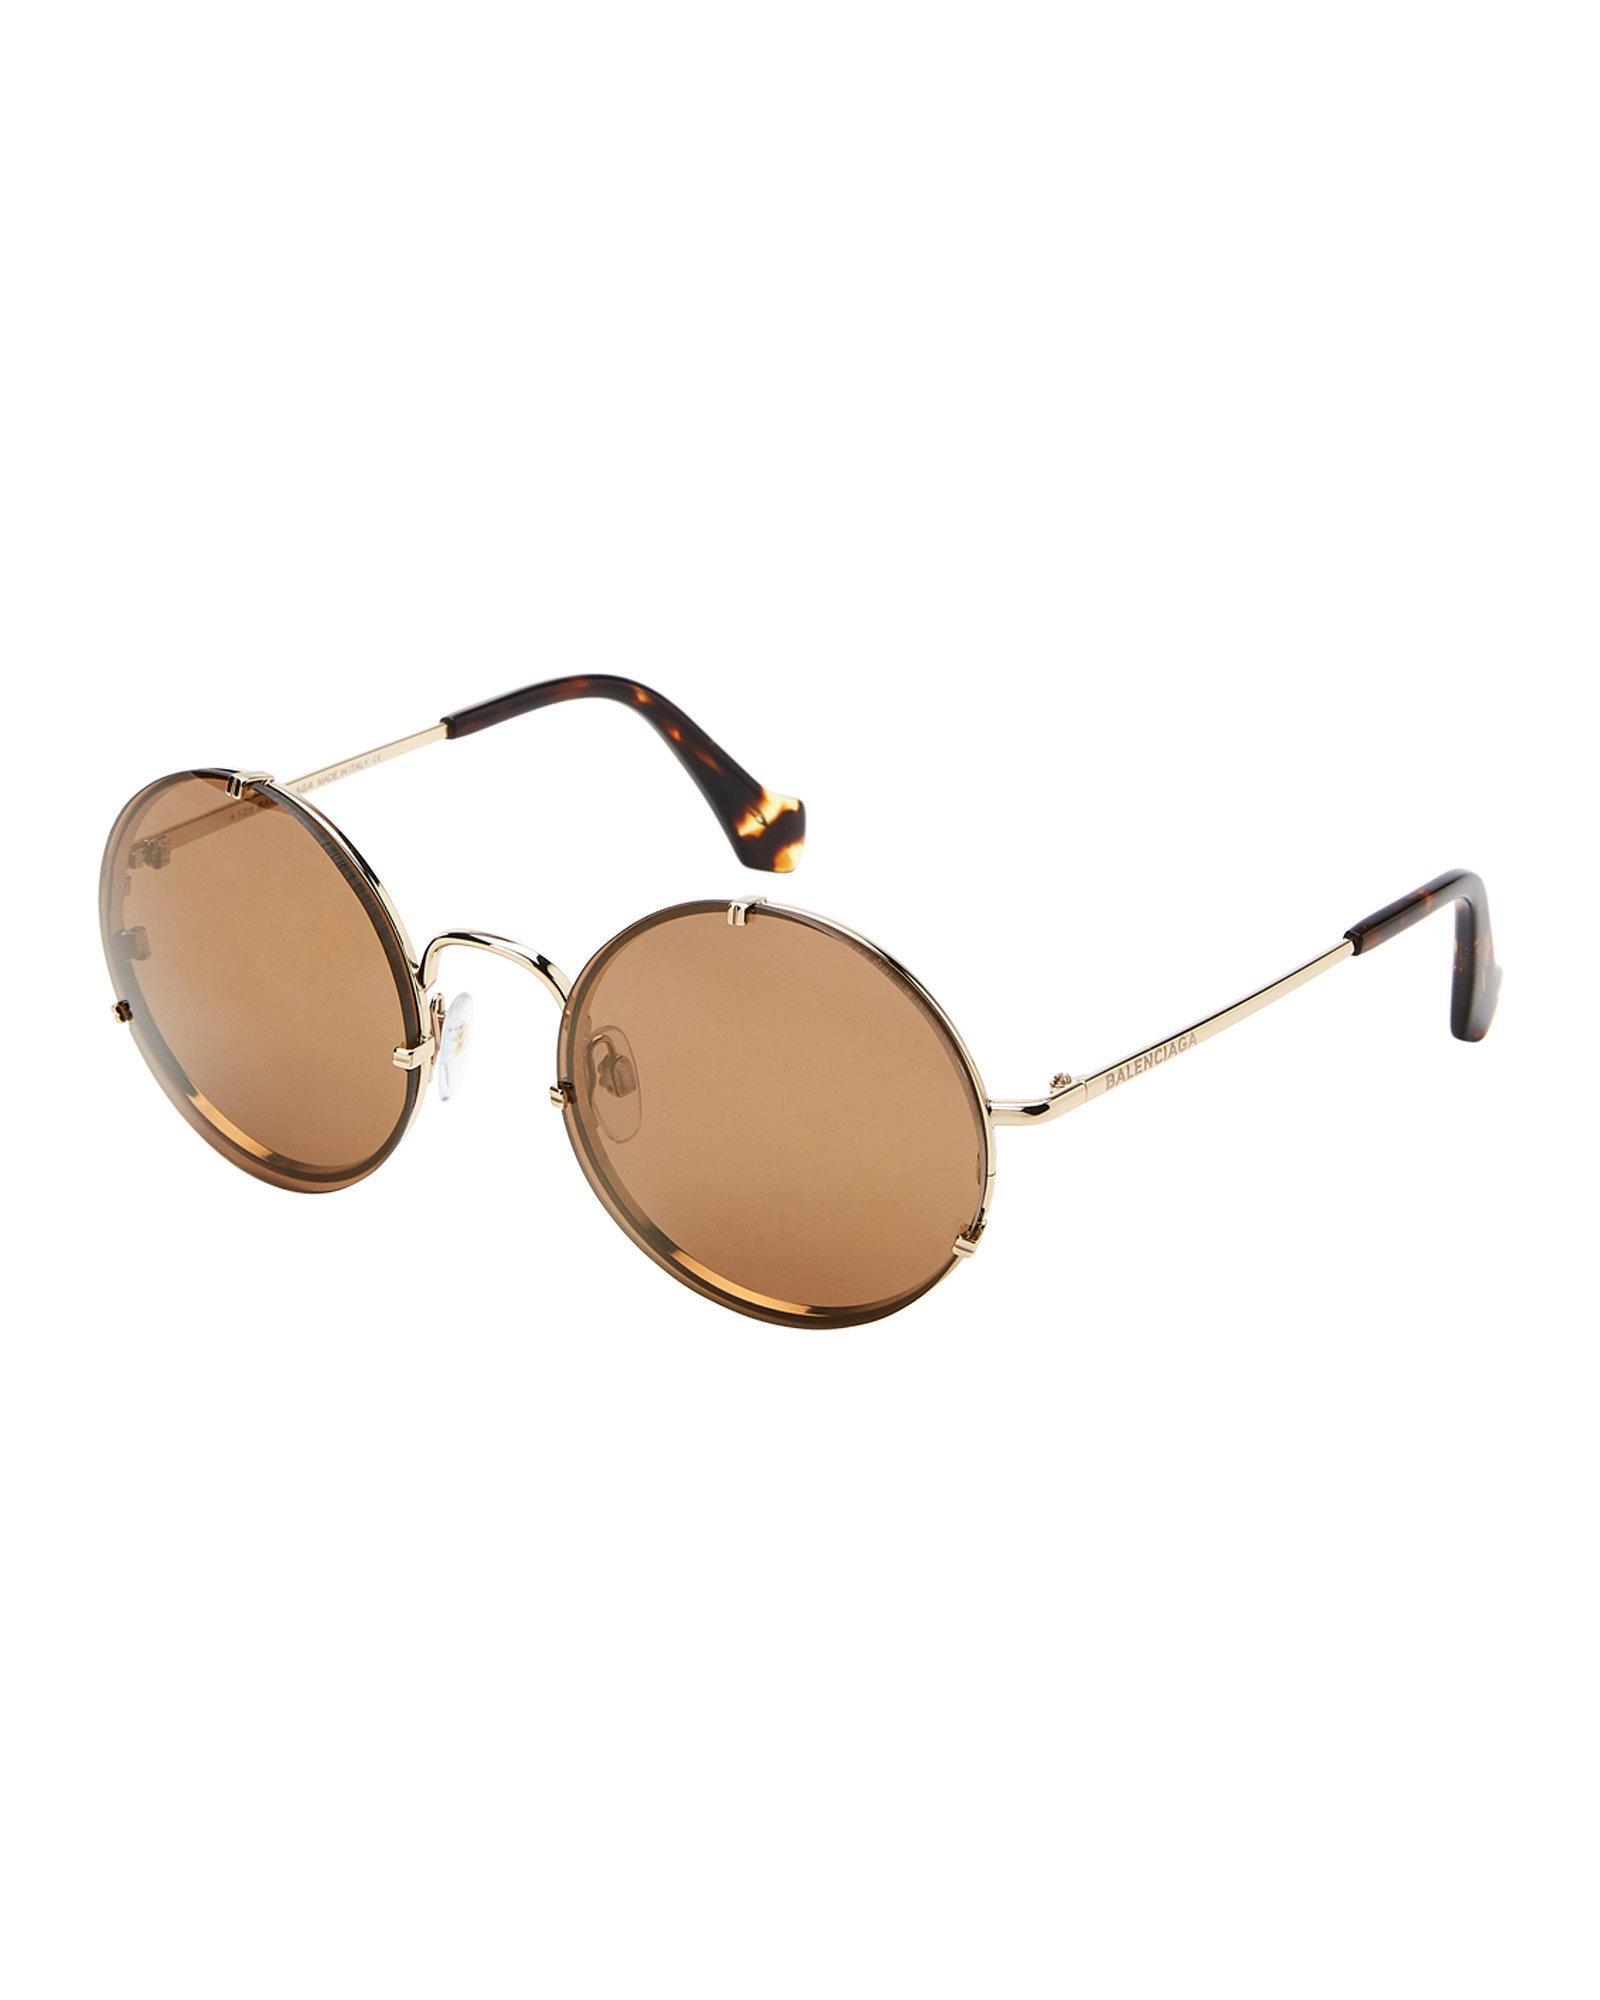 db4678b166 Balenciaga. Women s Ba0086 33g Gold-tone   Tortoiseshell-look Round  Sunglasses